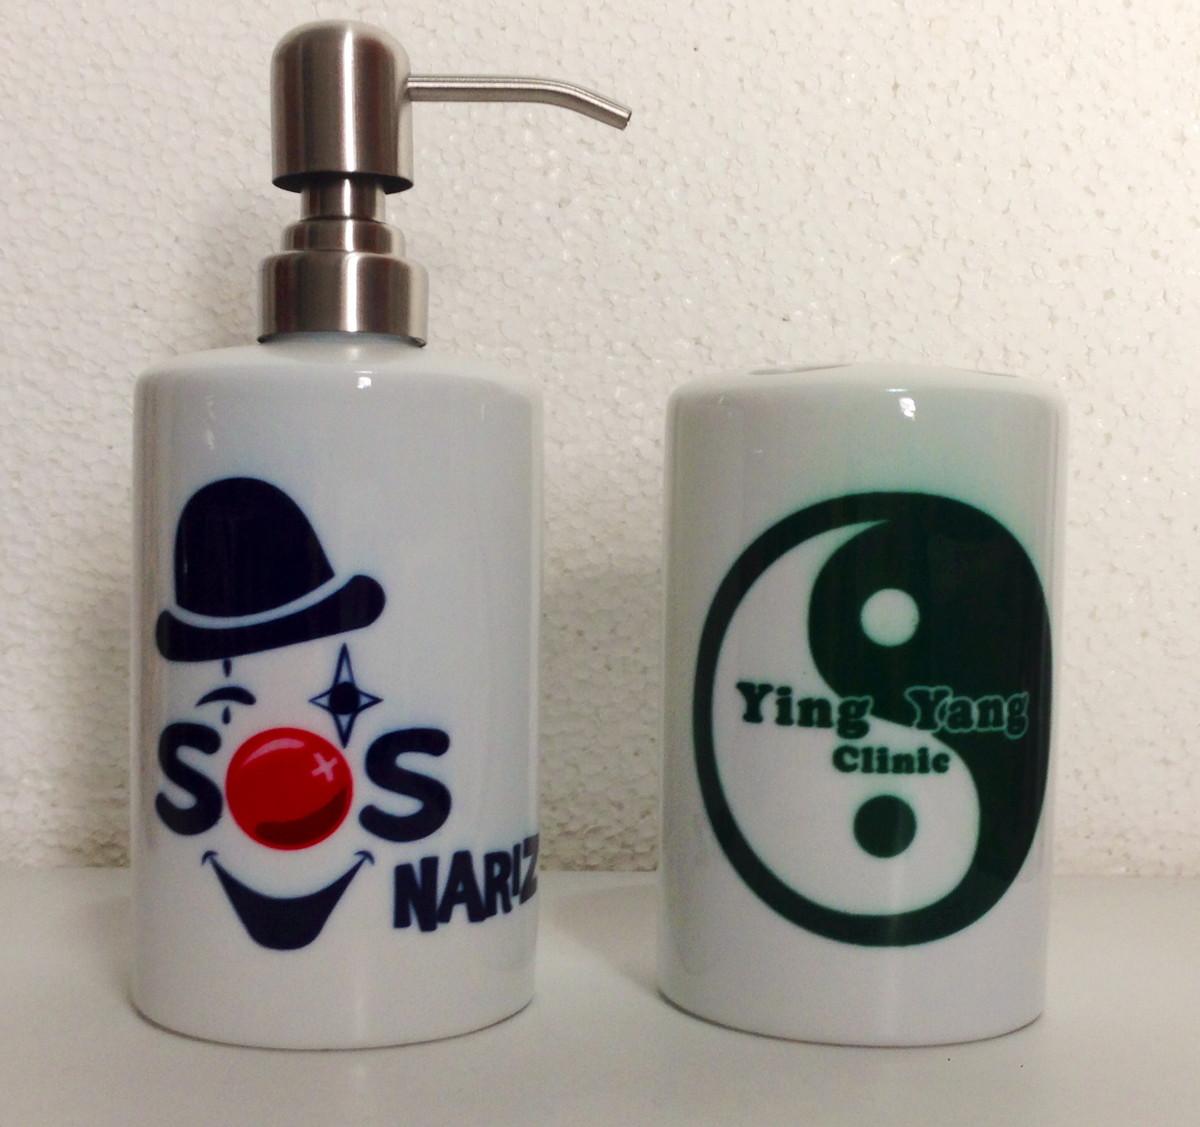 kit para banheiro personalizado casa kit para banheiro personalizado  #781F1E 1200 1127